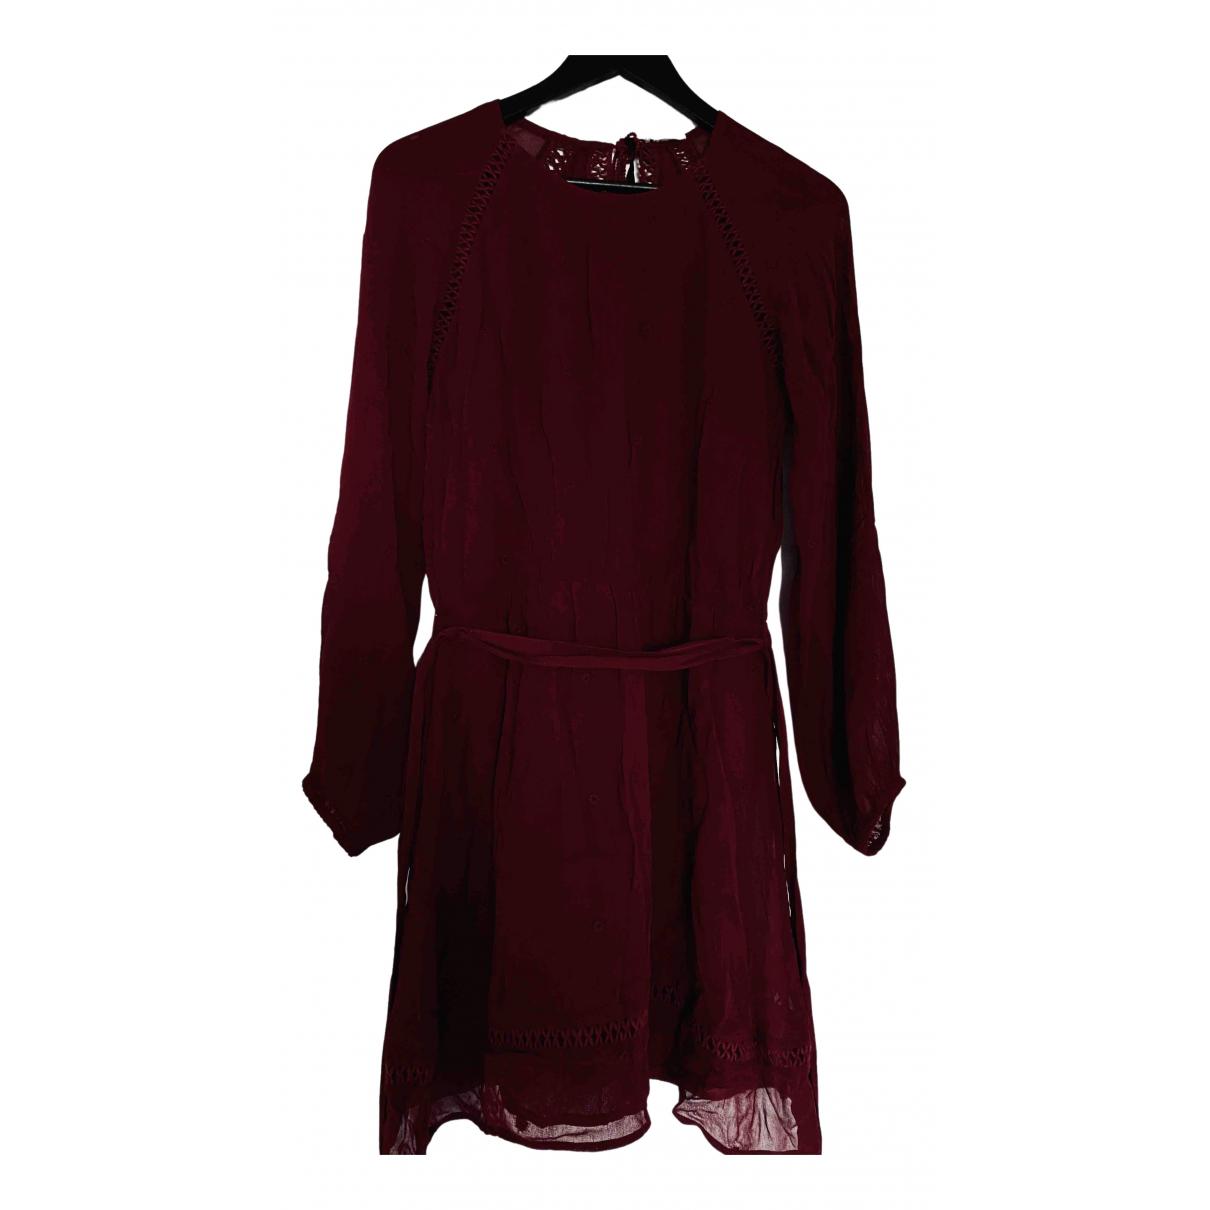 Sézane \N Burgundy dress for Women 38 FR